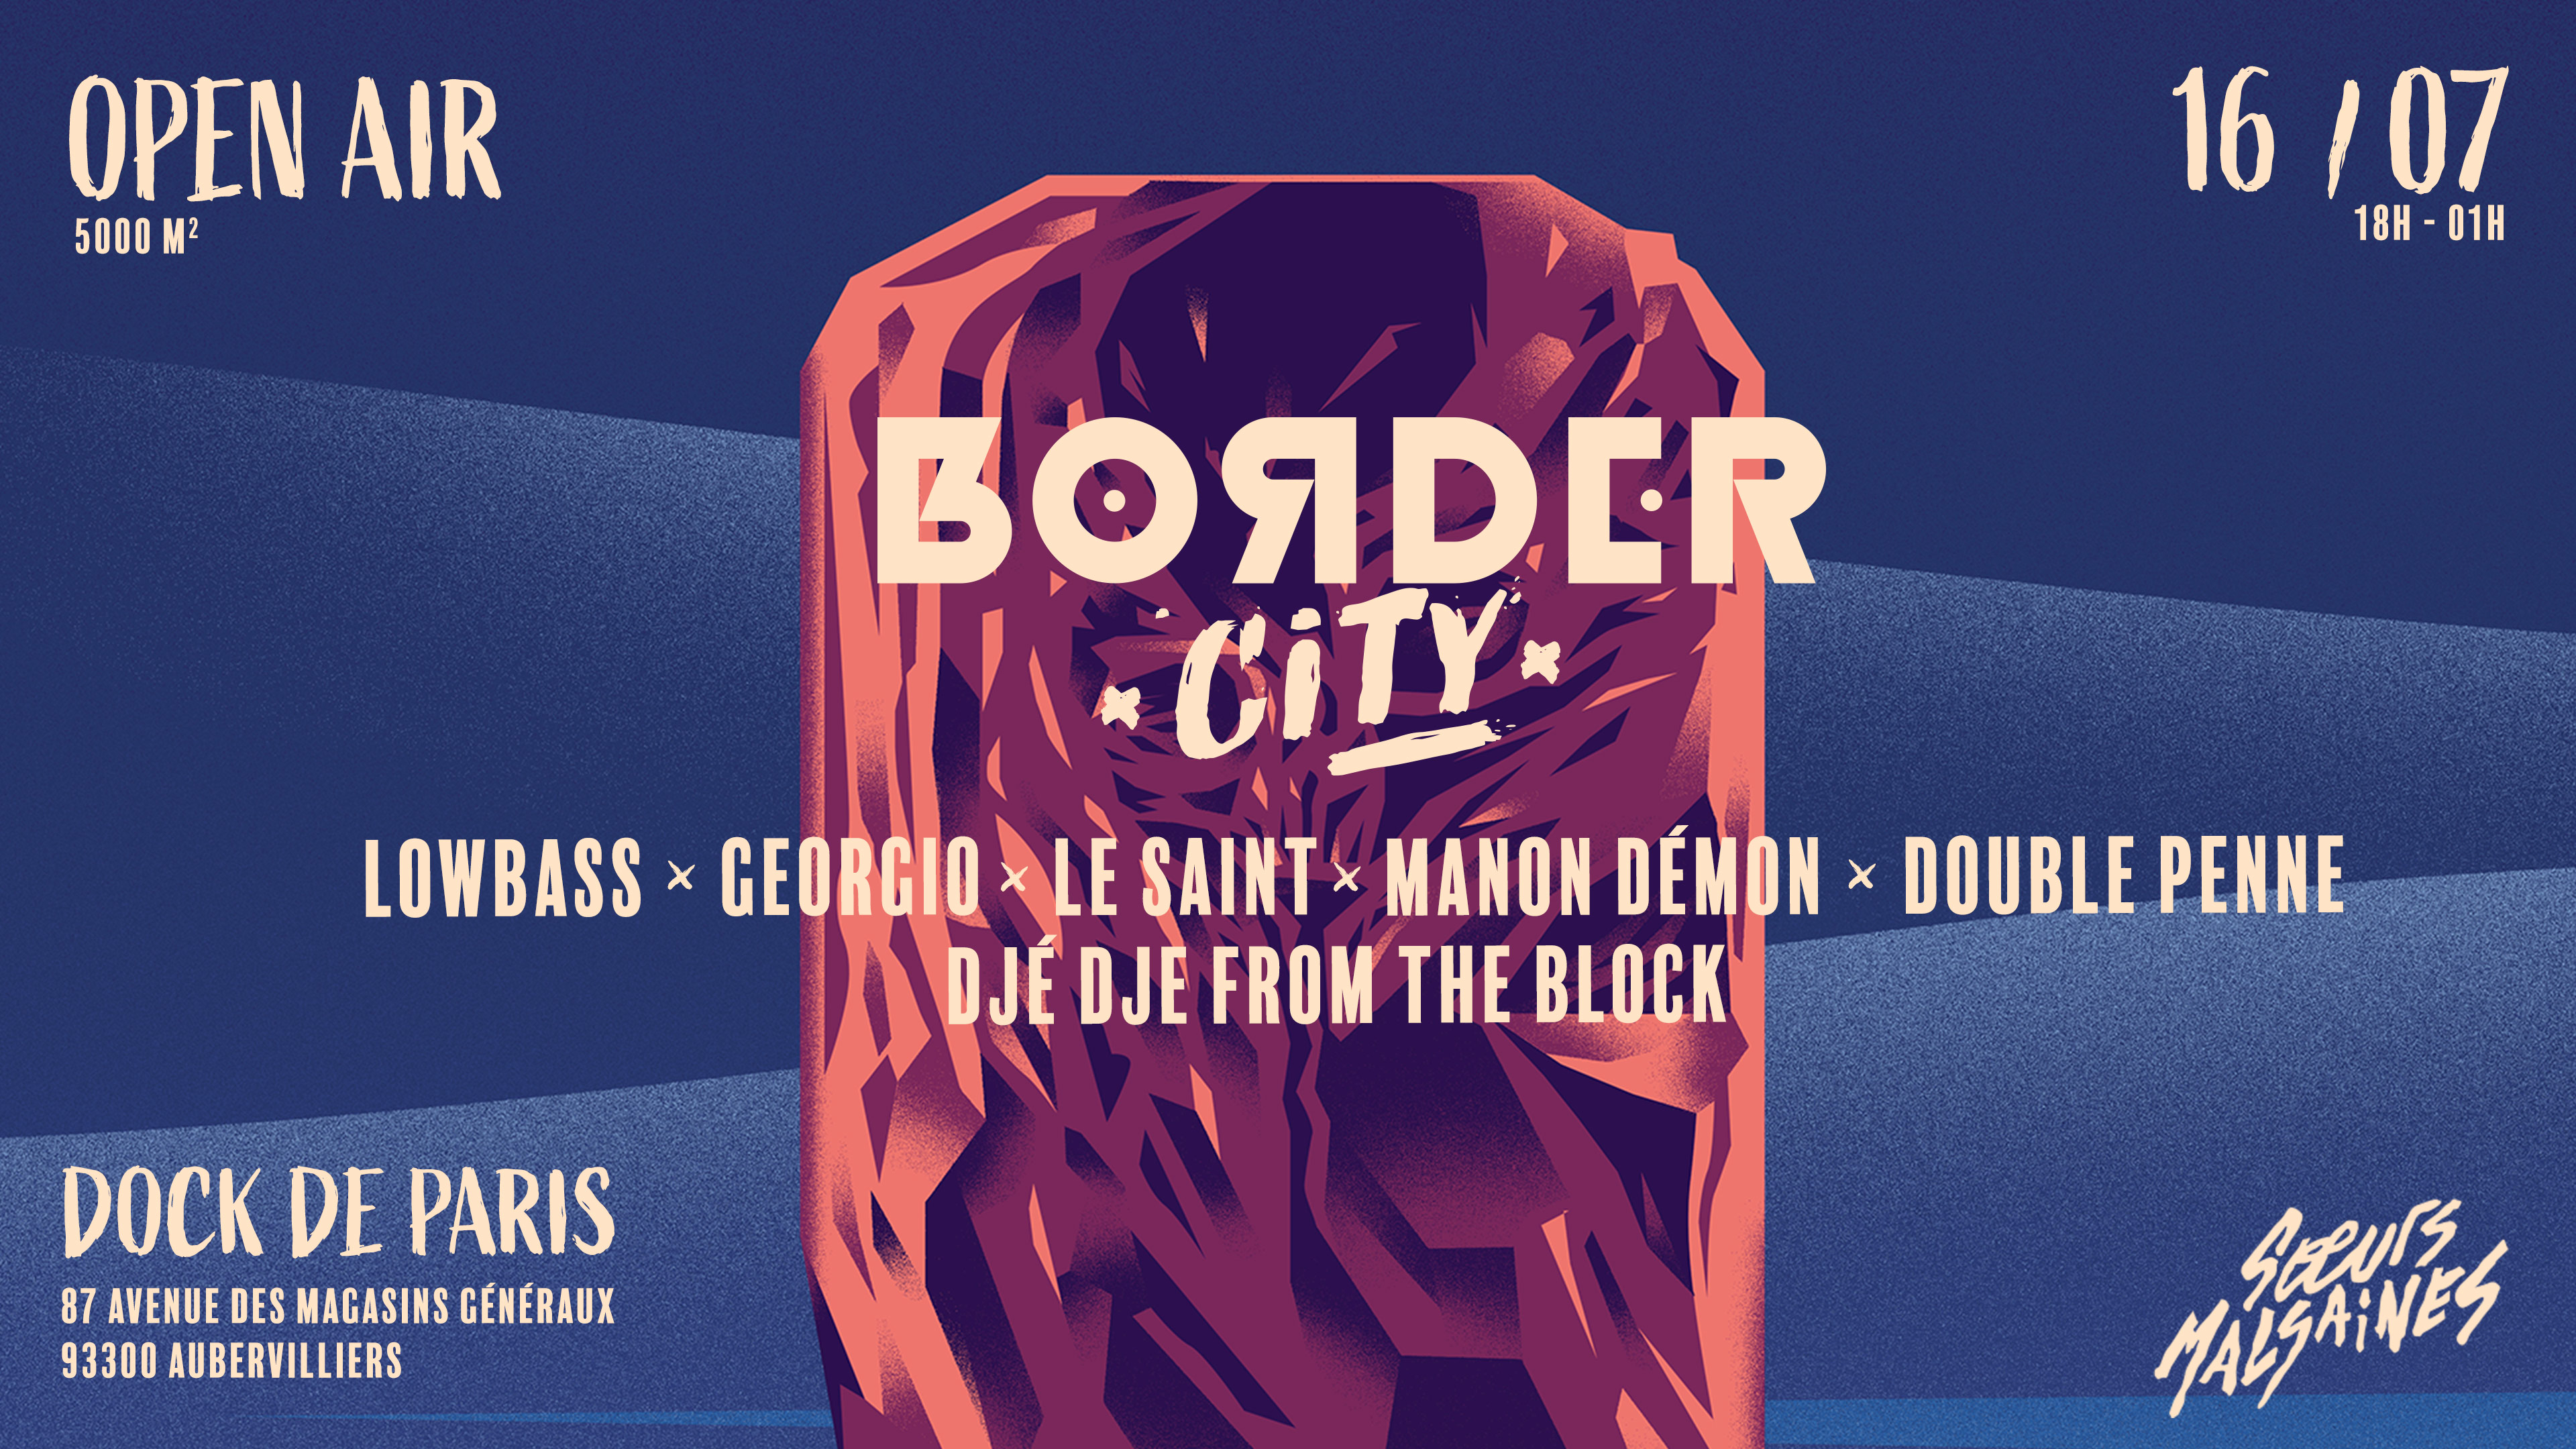 Border City x Soeurs Malsaines